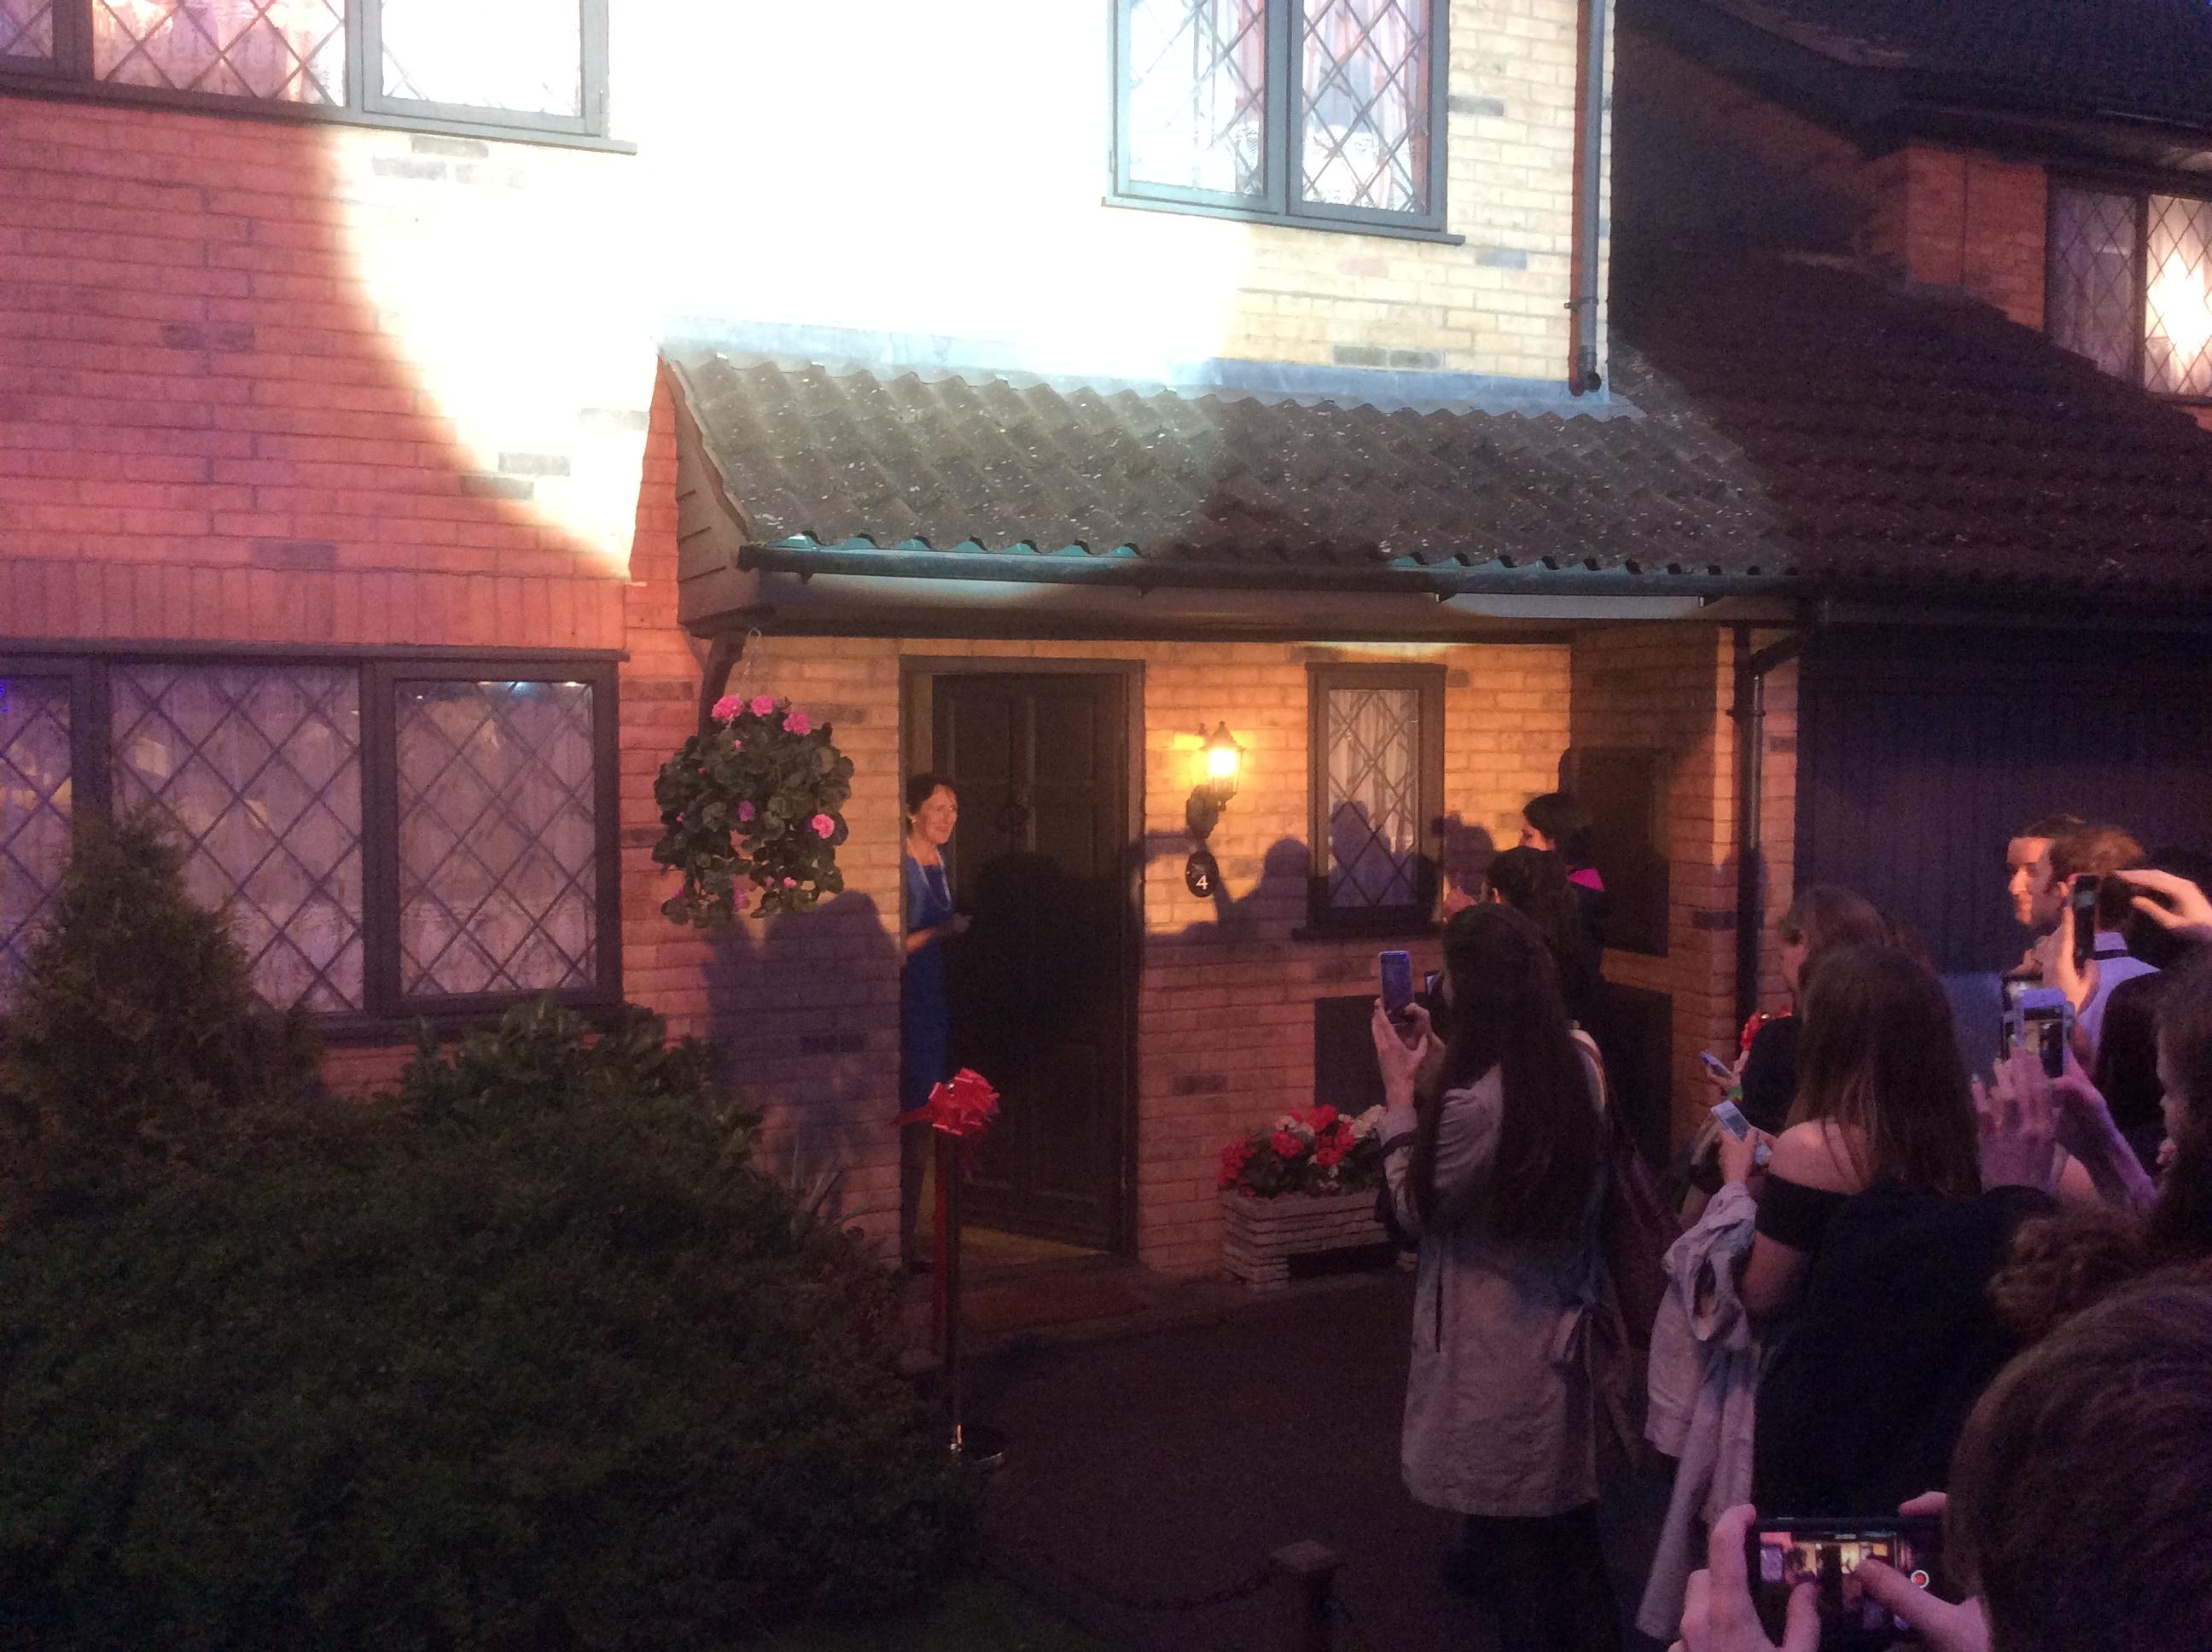 Fiona Shaw inaugure le 4 Privet Drive au Warner Bros. Studio Tour London : The Making Of Harry Potter